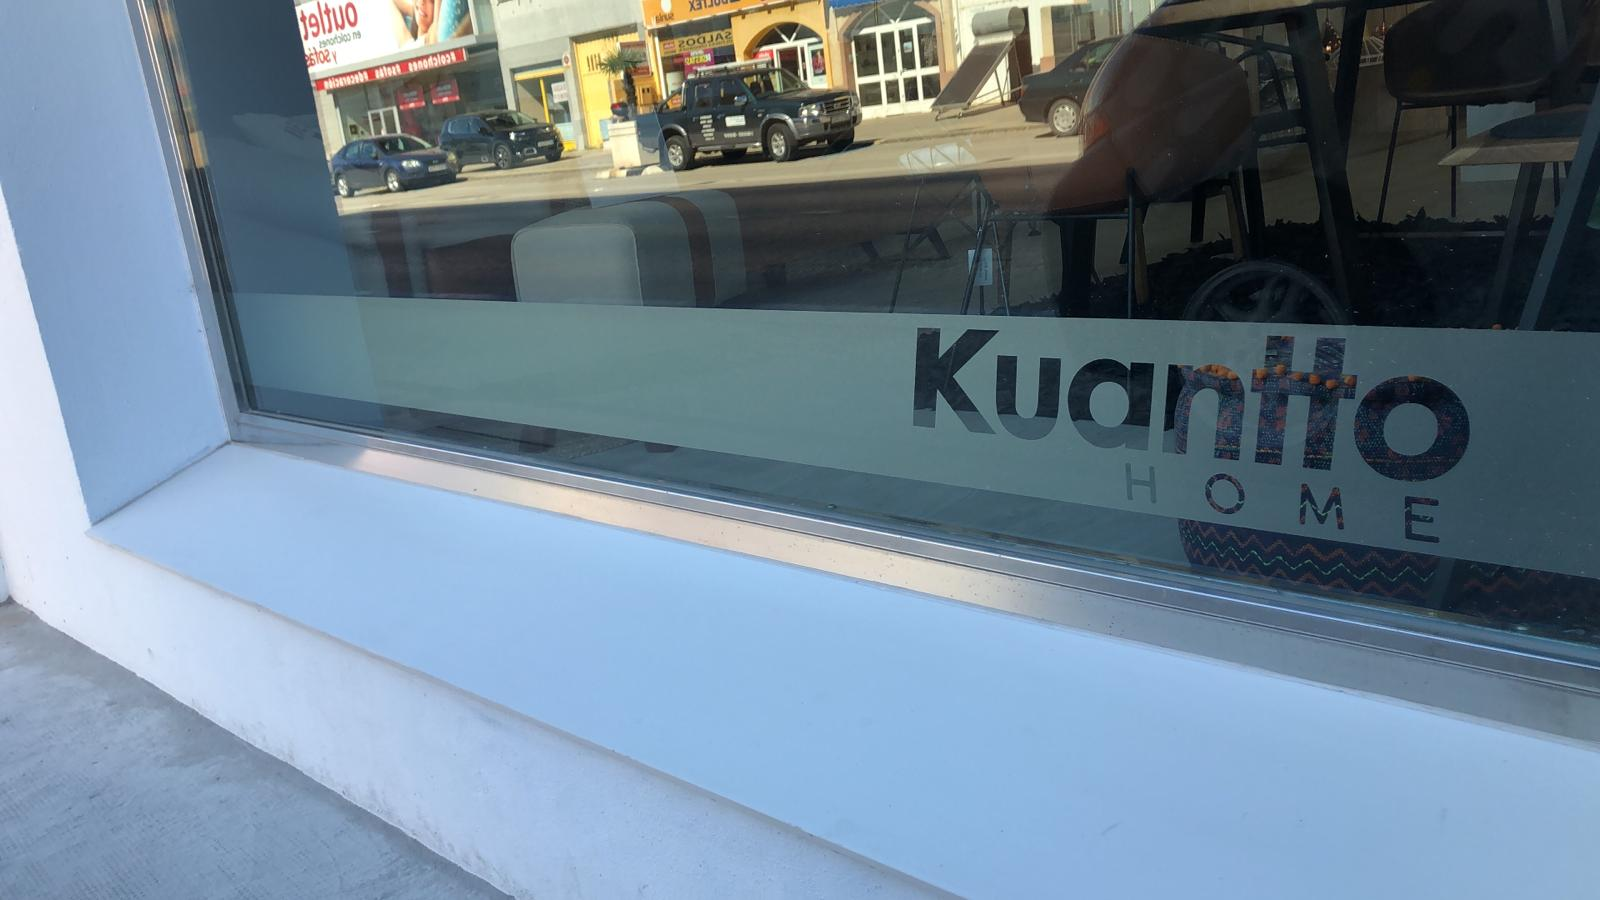 Vinilo ácido de Kuantto home para escaparate